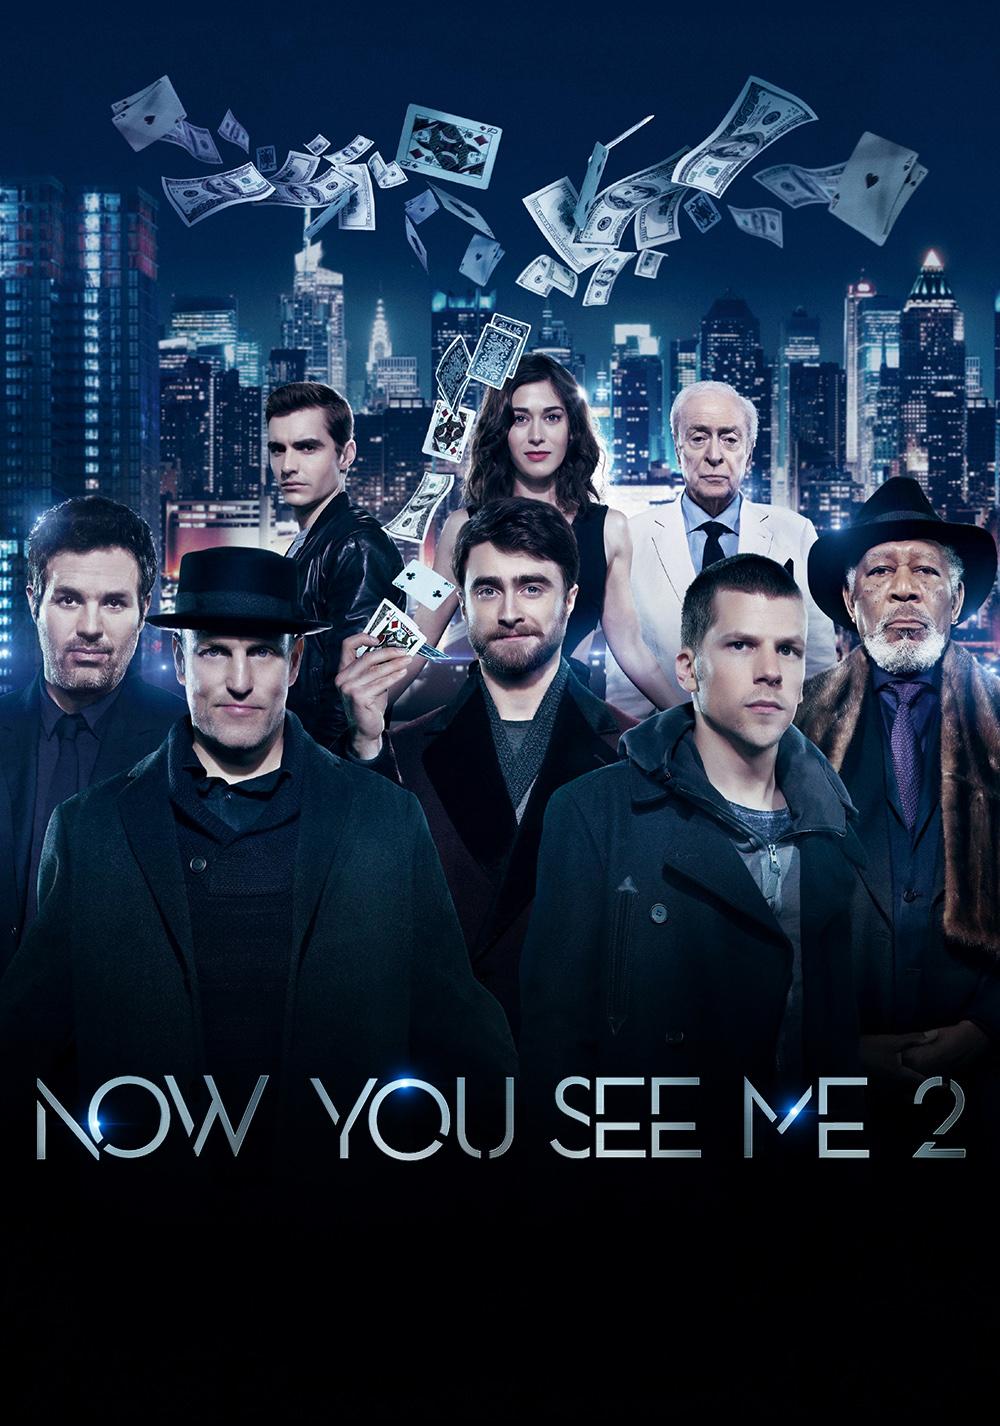 Now You See Me 2 Movie Fanart Fanart Tv